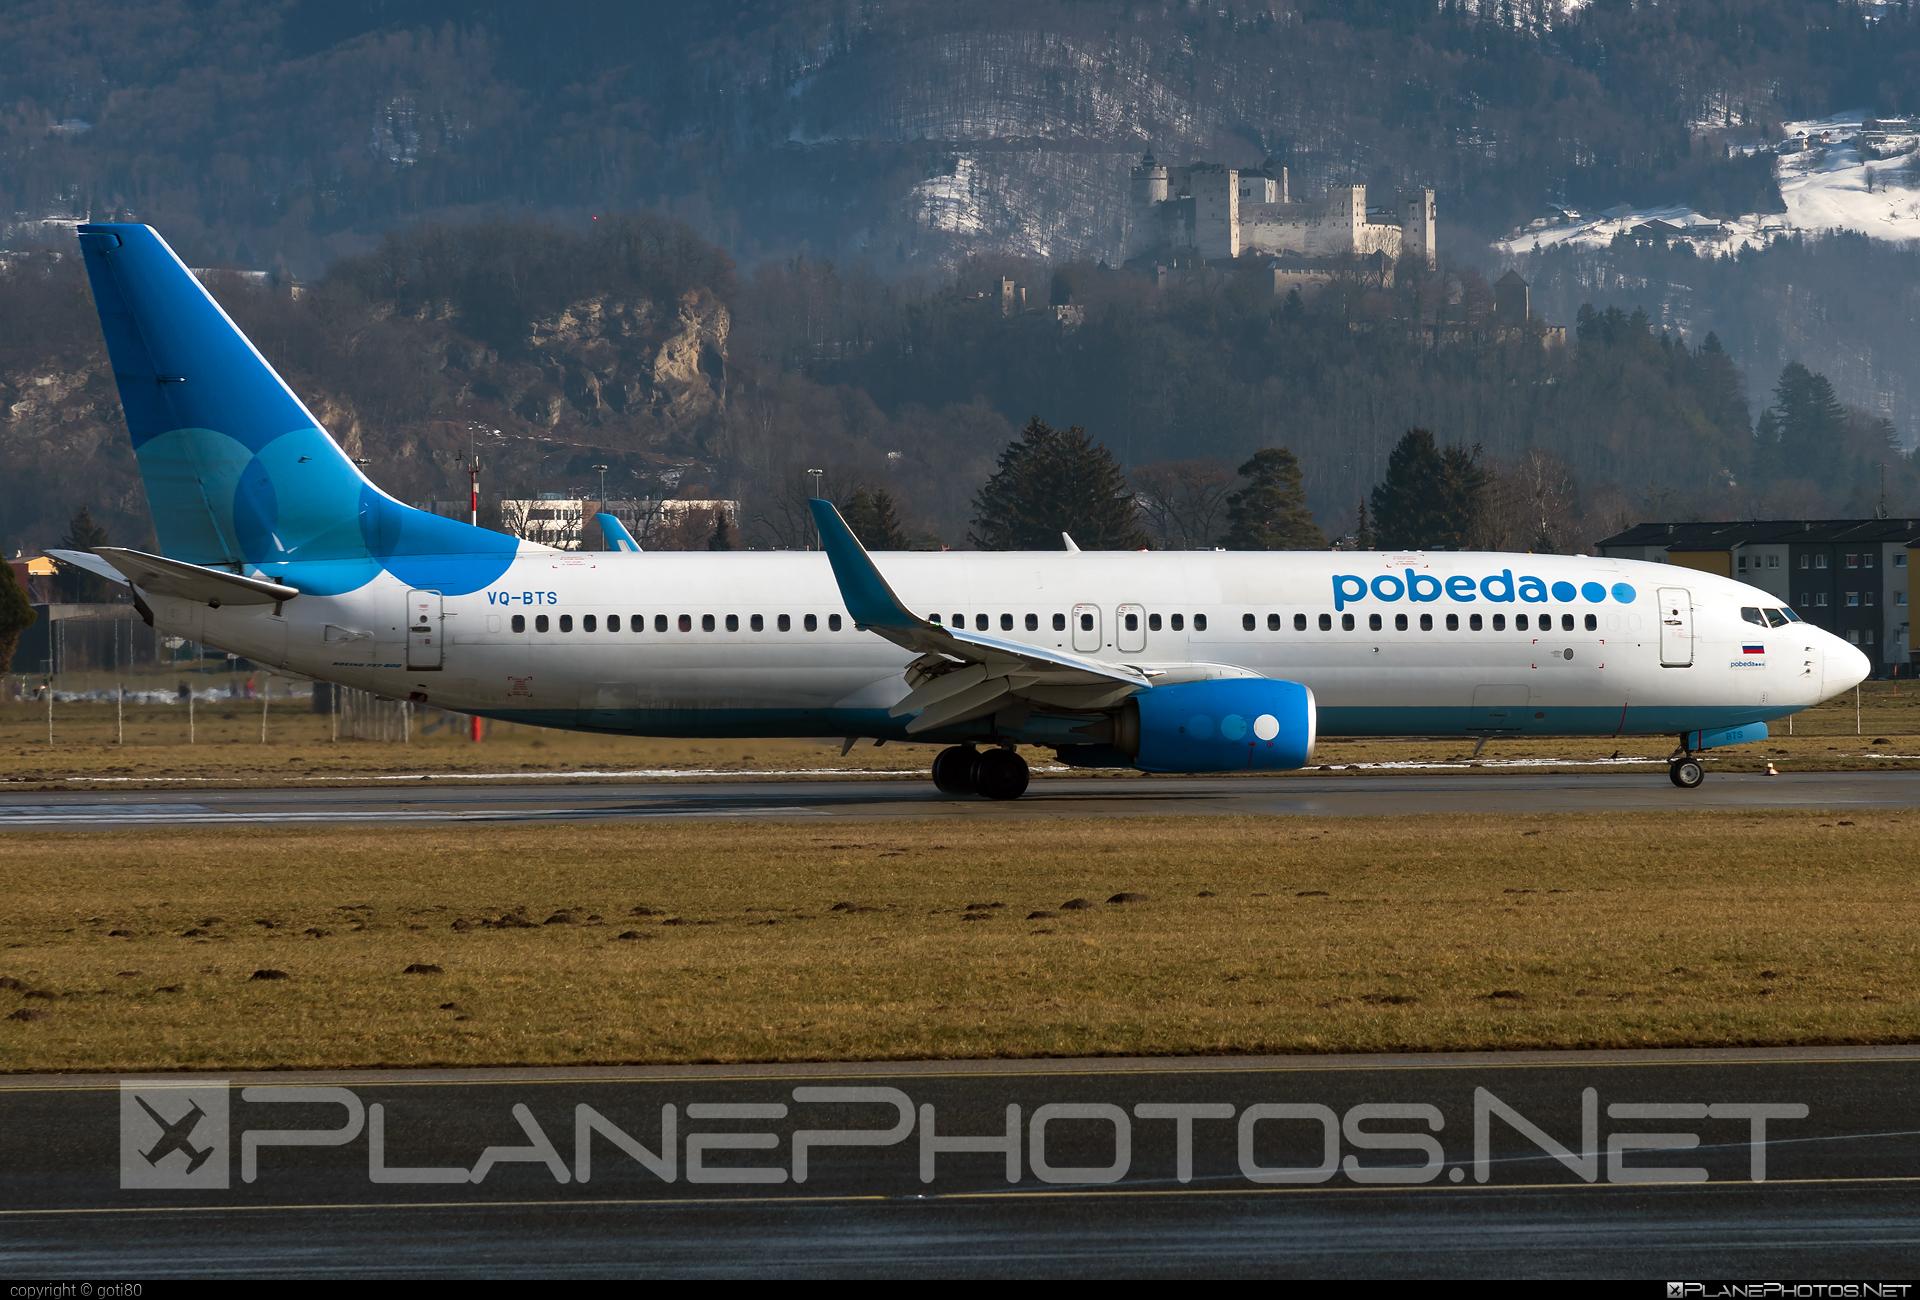 Pobeda Boeing 737-800 - VQ-BTS #b737 #b737nextgen #b737ng #boeing #boeing737